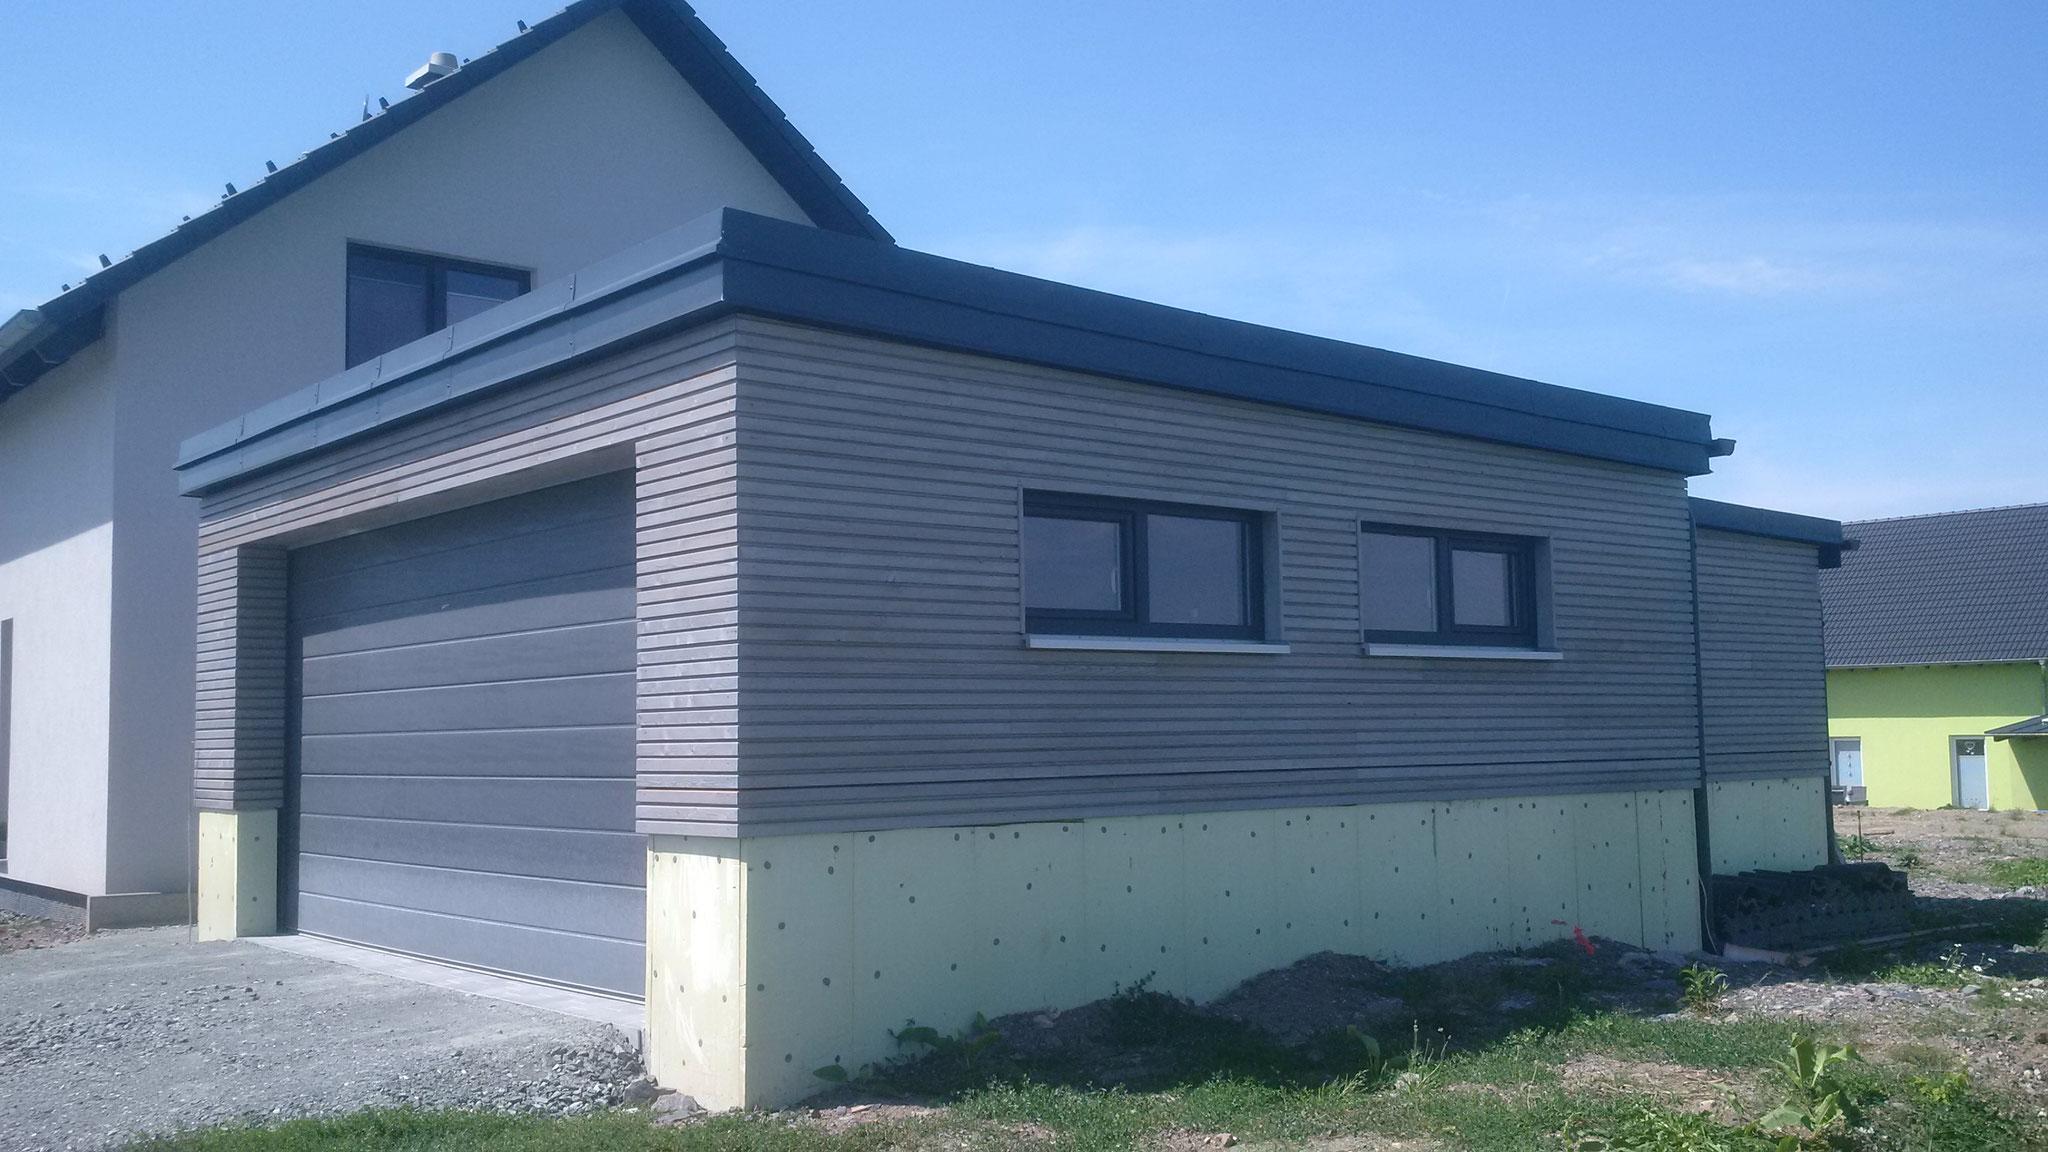 Garage in Holzrahmenbauweise